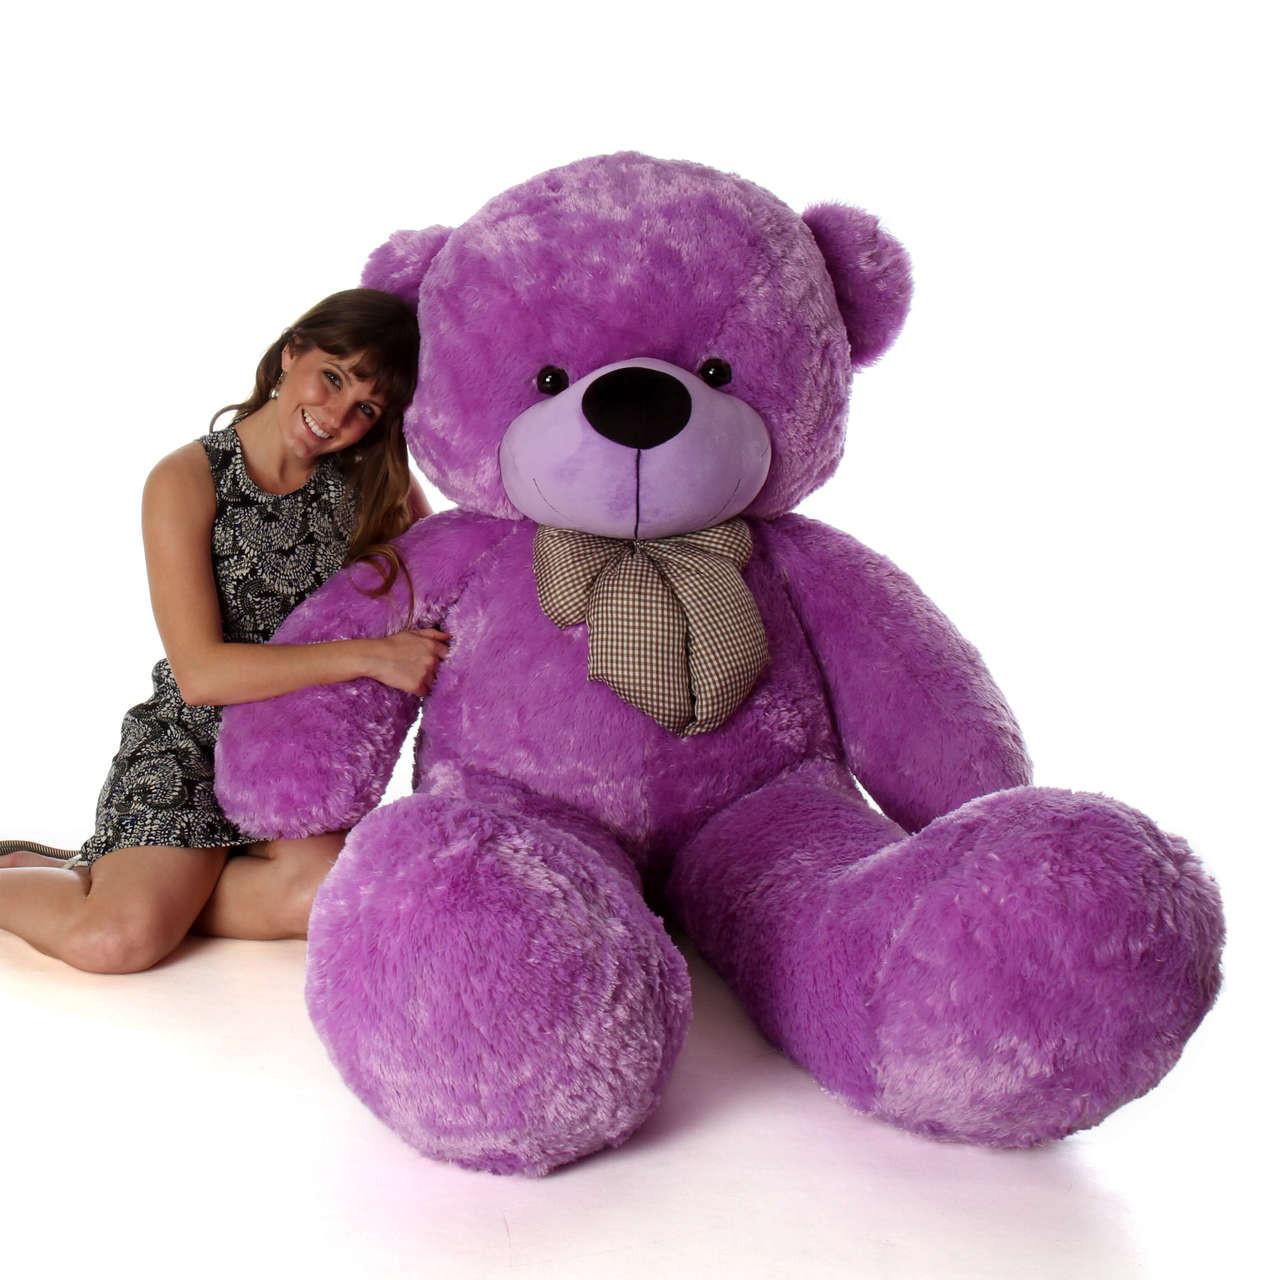 life size 6ft purple teddy bear with vibrant light purple fur